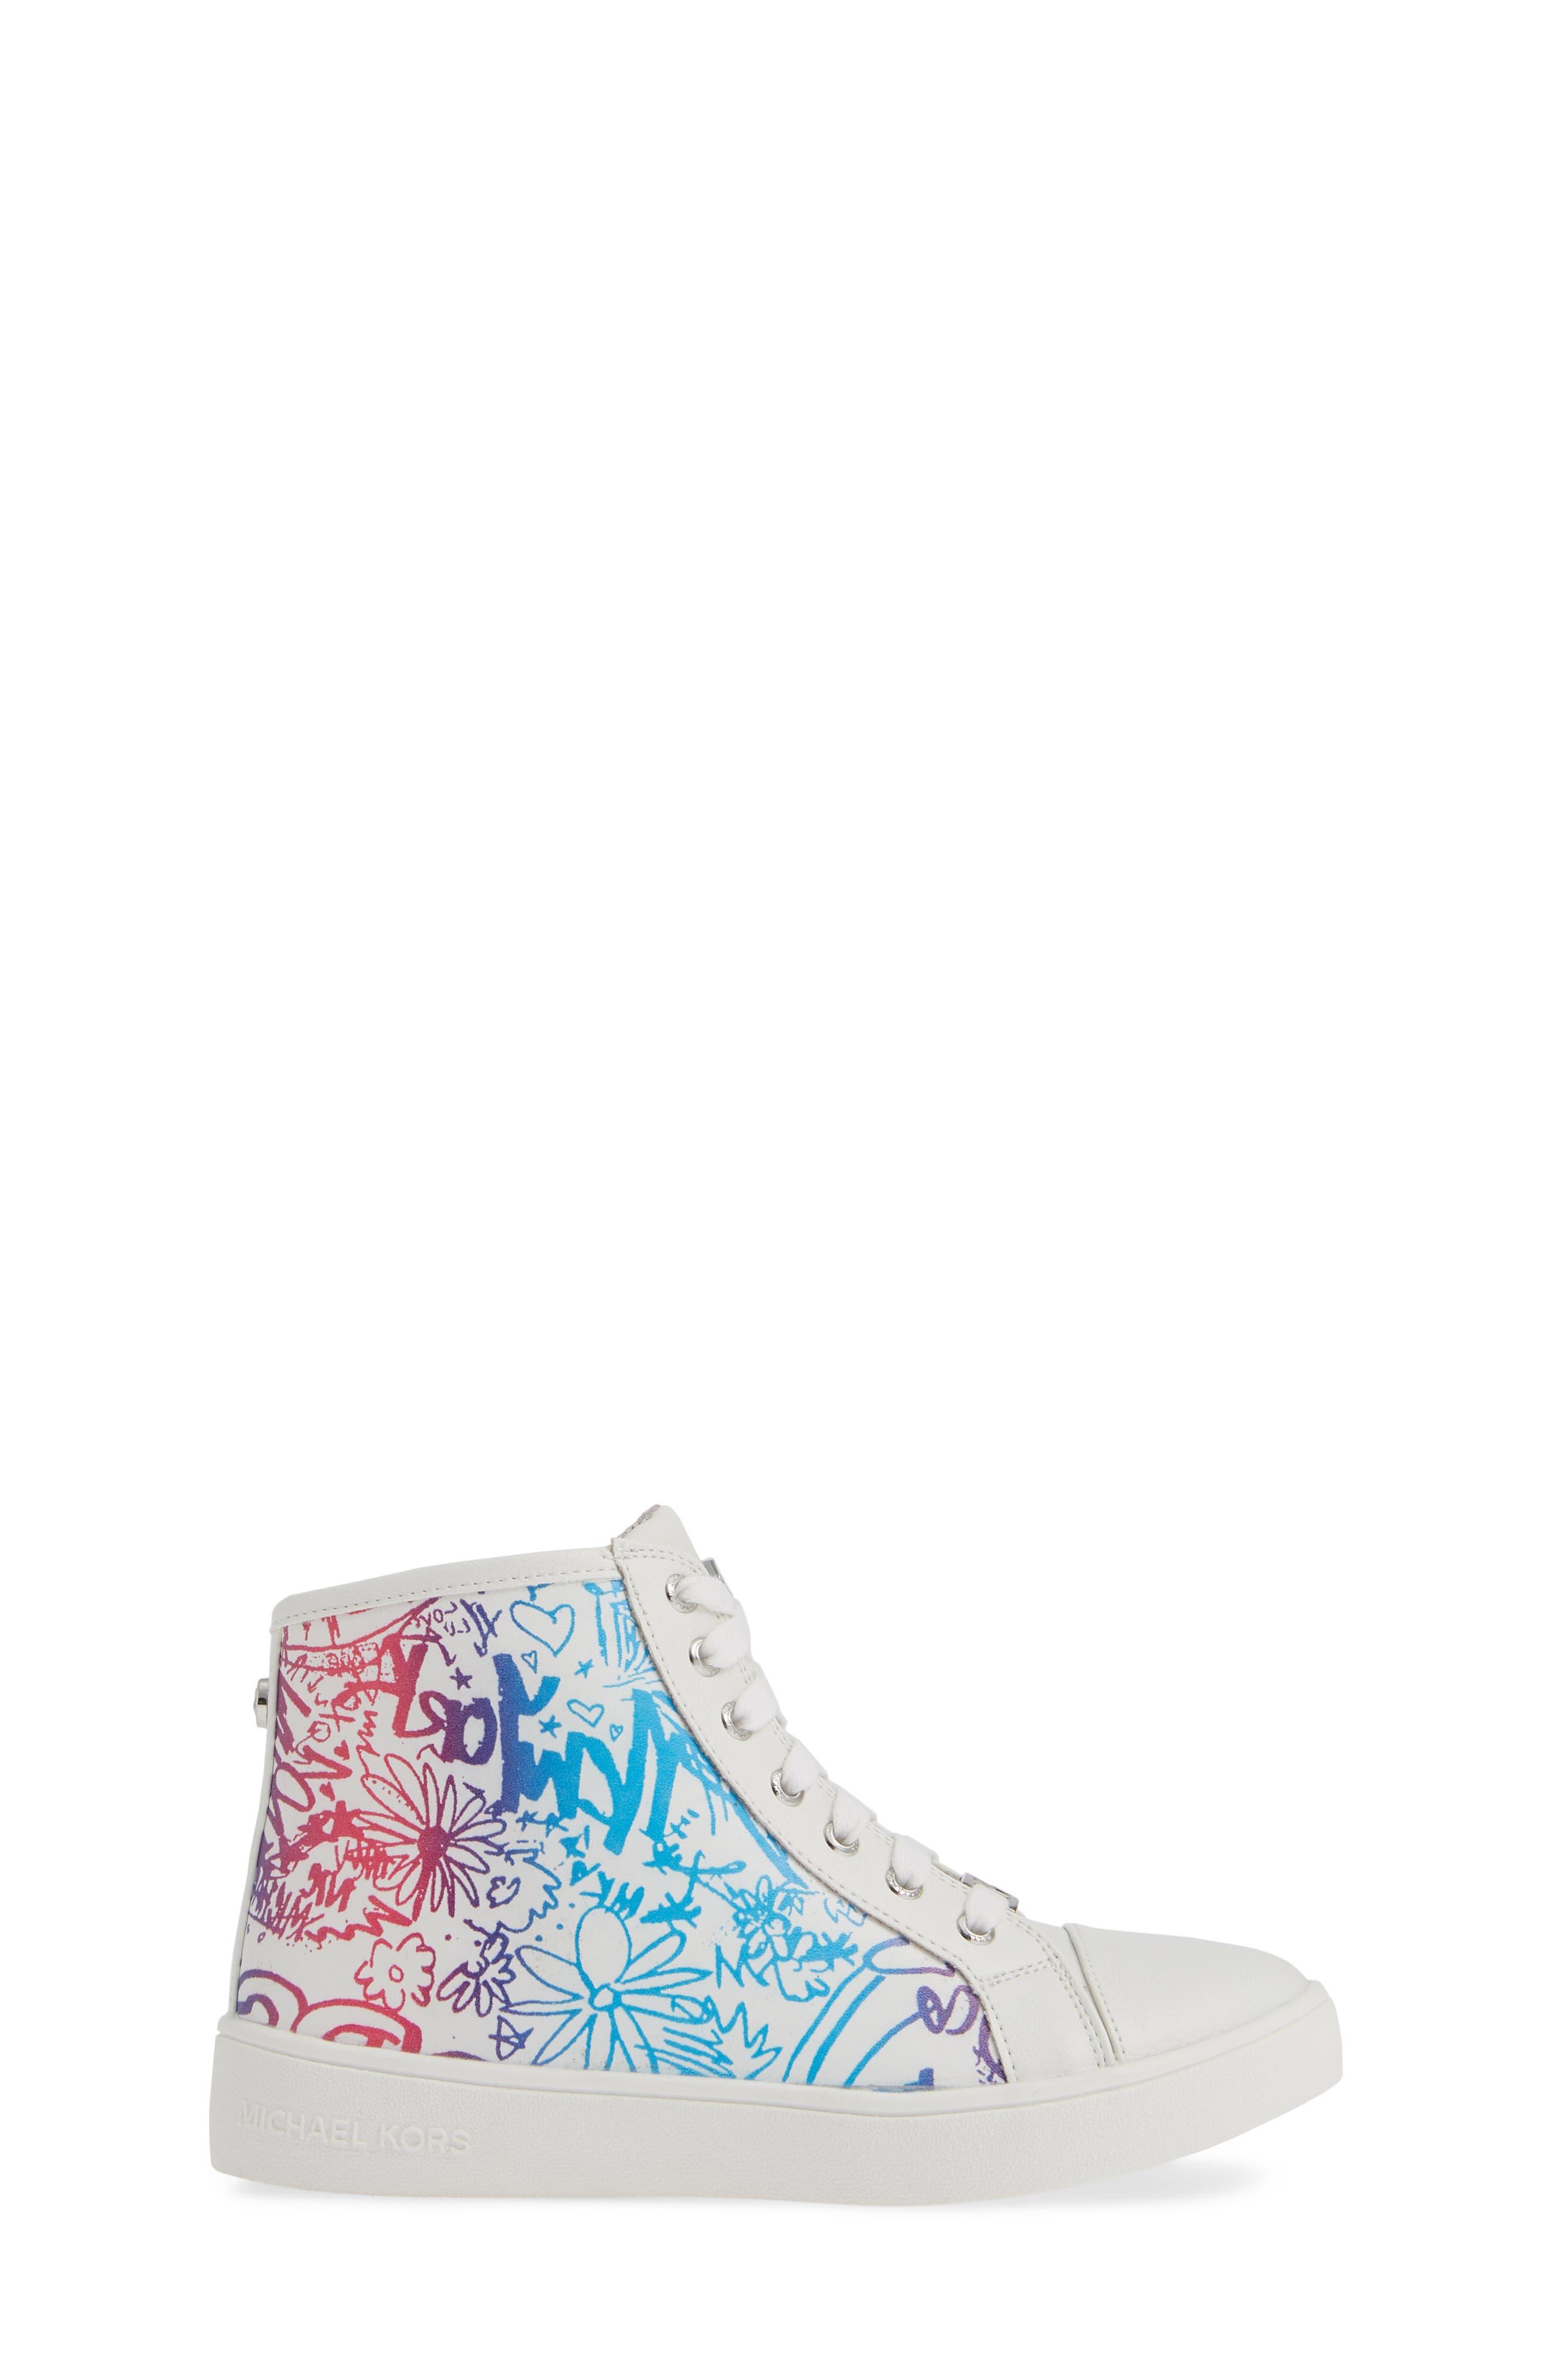 Ivy Spectra High Top Sneaker,                             Alternate thumbnail 3, color,                             WHITE MULTI